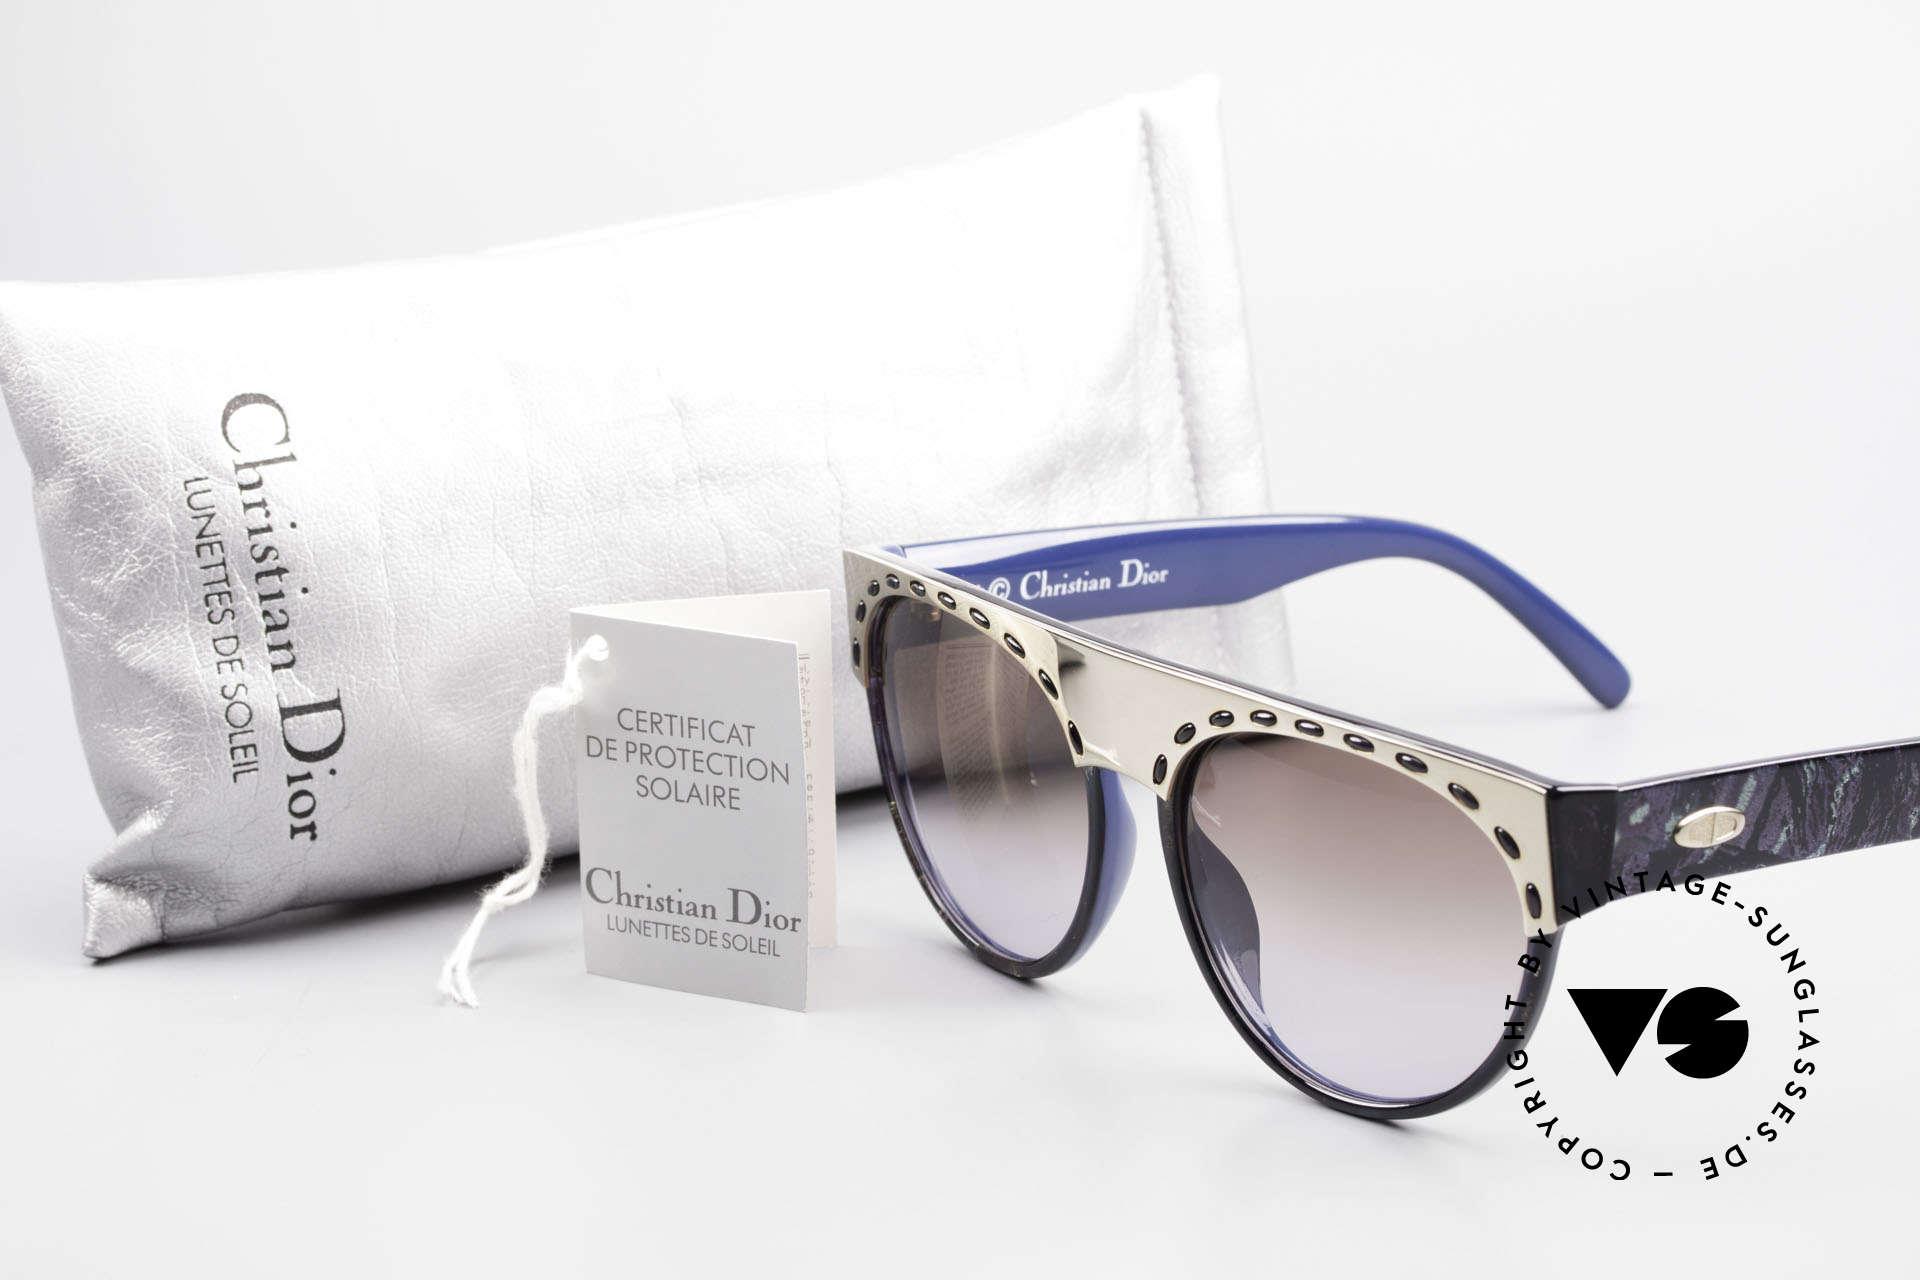 Christian Dior 2437 Vintage Ladies Sunglasses 80's, Size: medium, Made for Women